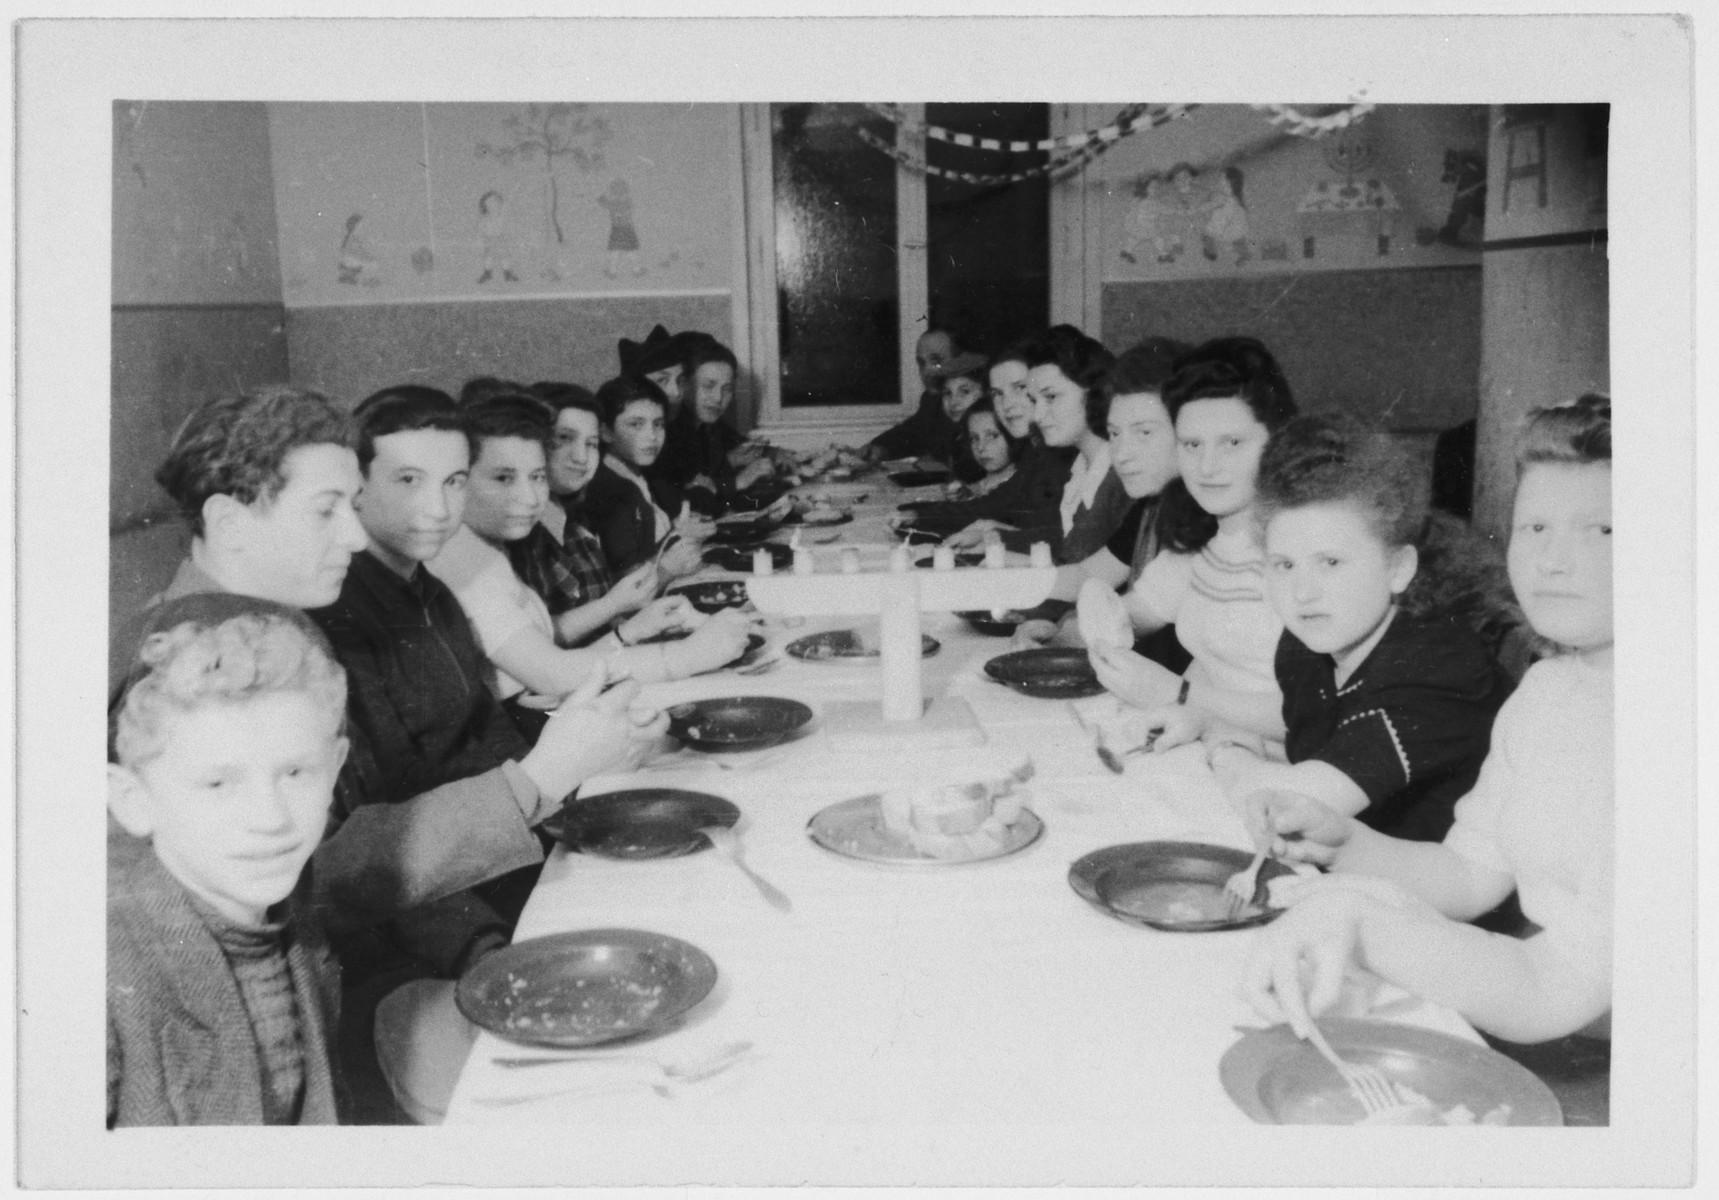 Children celebrate Hannukah in the Zeilsheim DP camp.  Szlomo Waks is pictured in the bottom left corner.